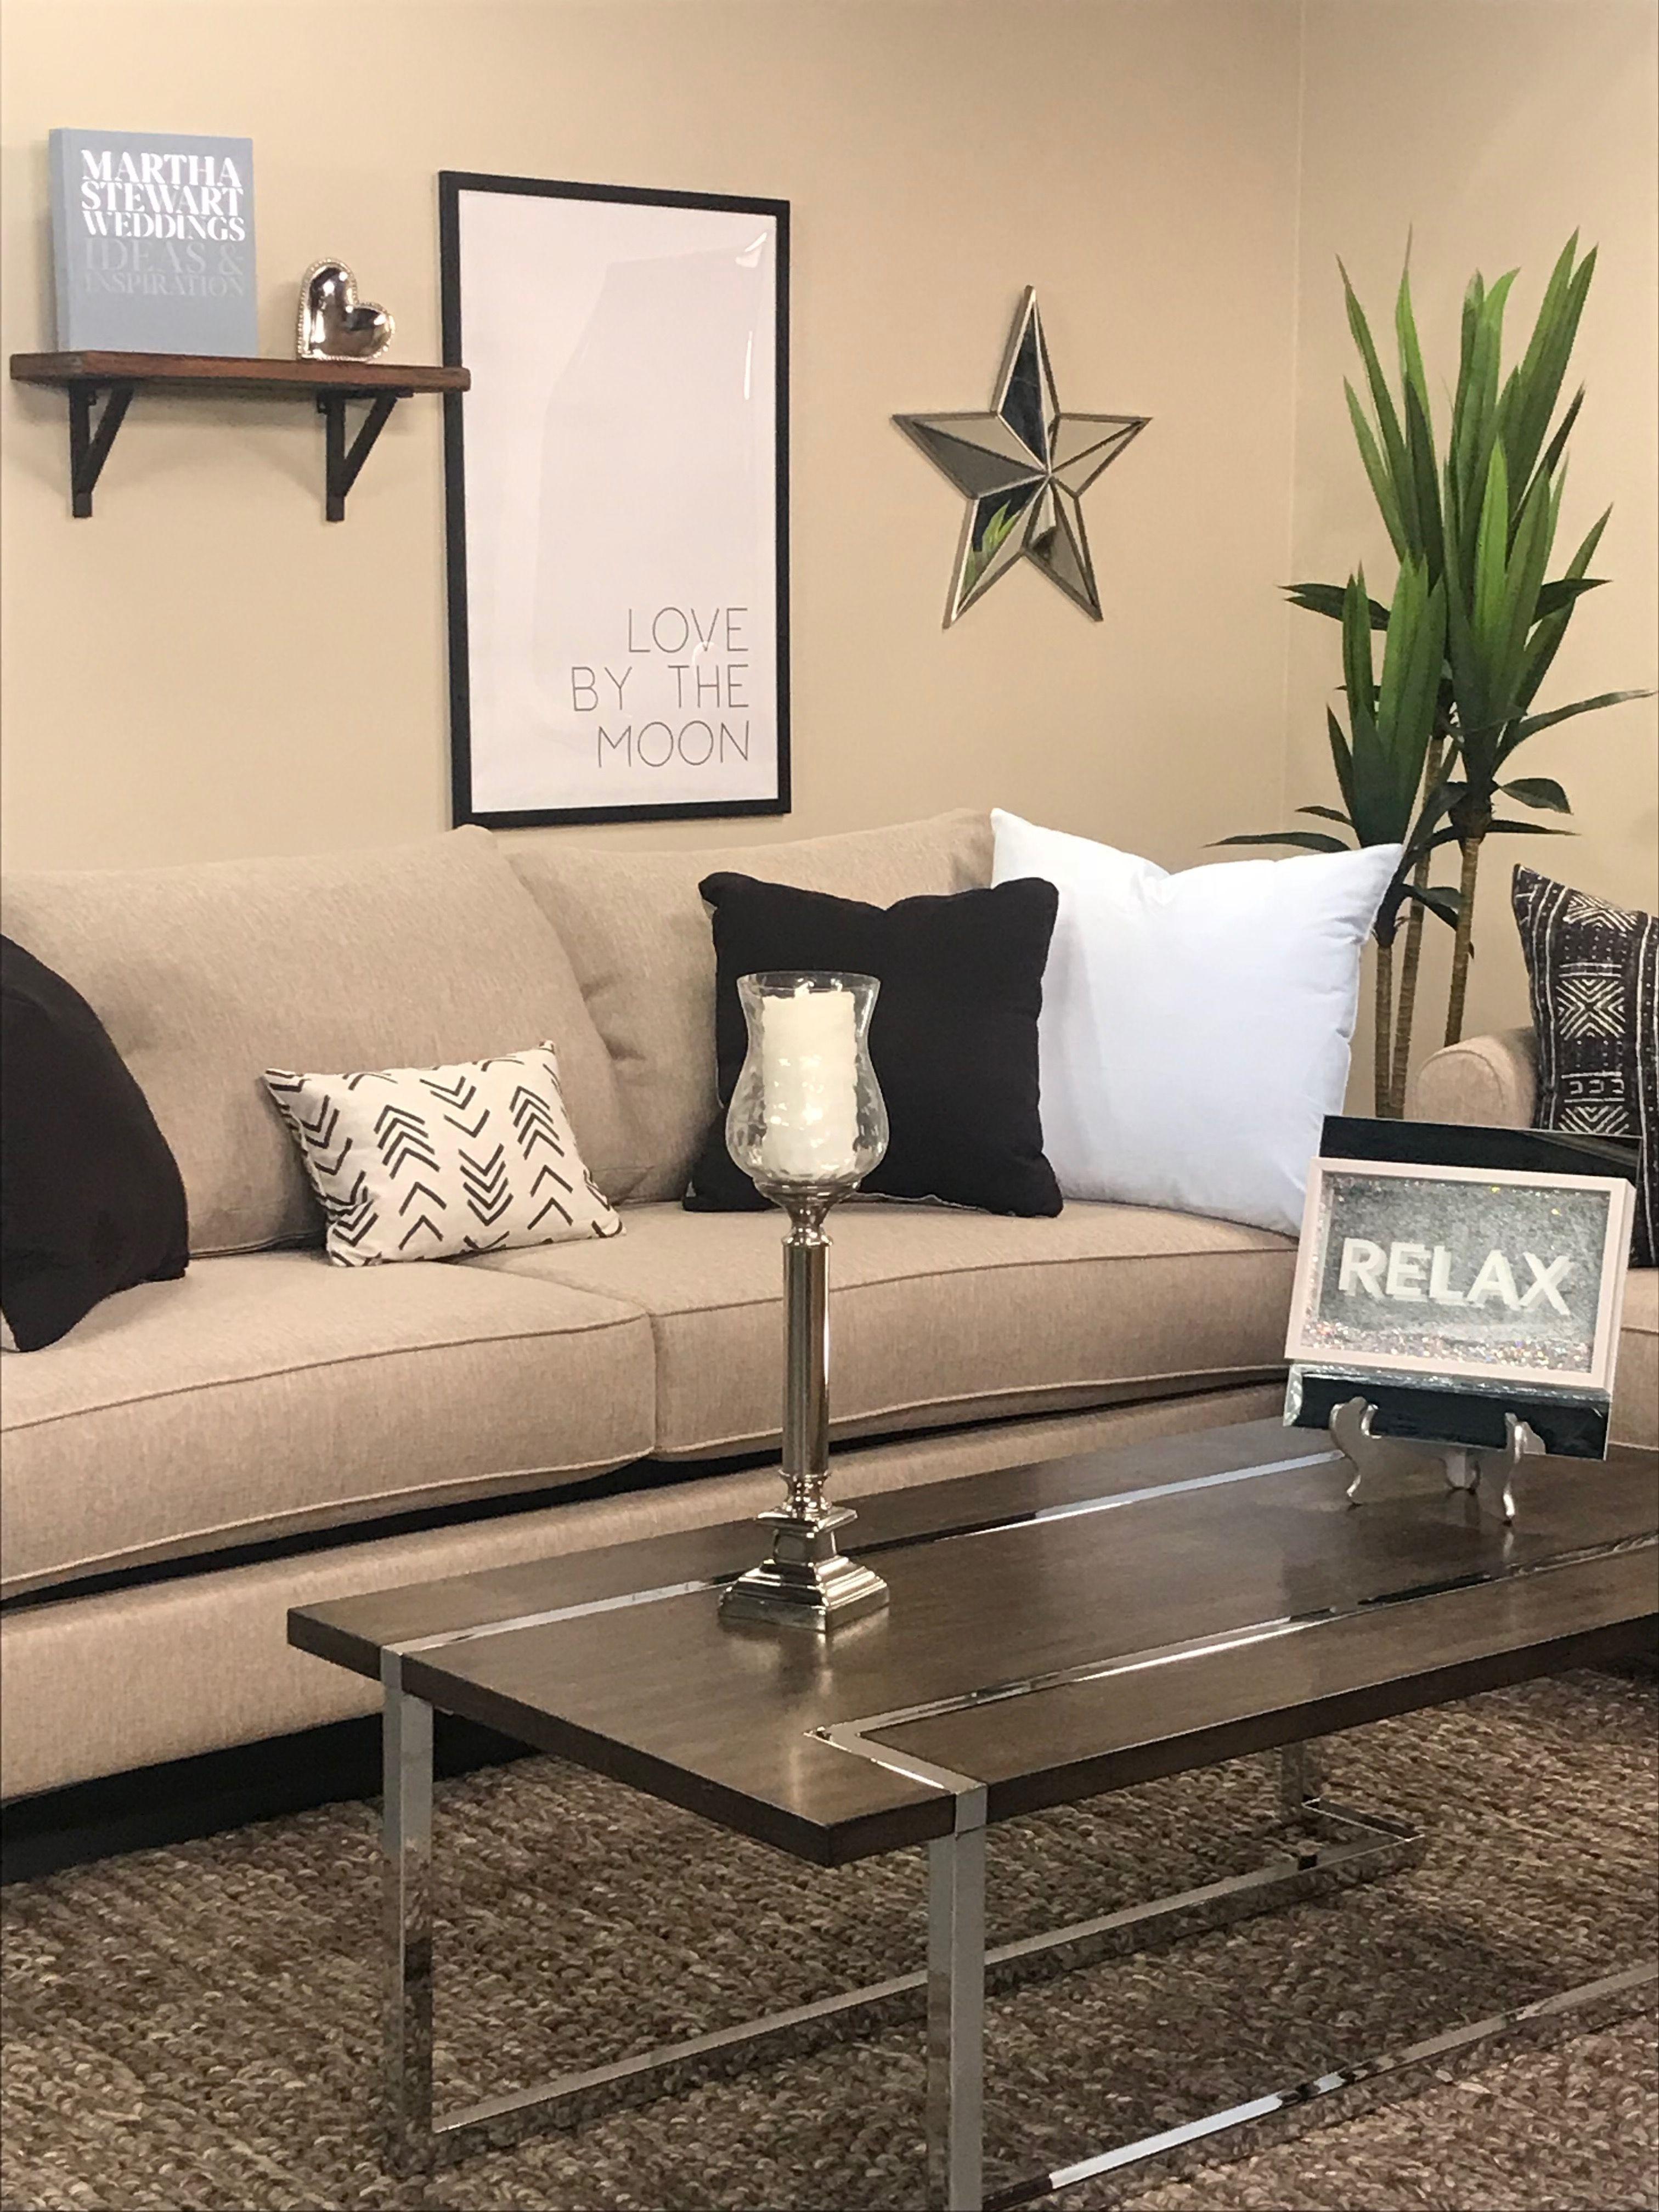 Design My Living Room Online: In Whittany's Living Room Design, She Used The Rachel